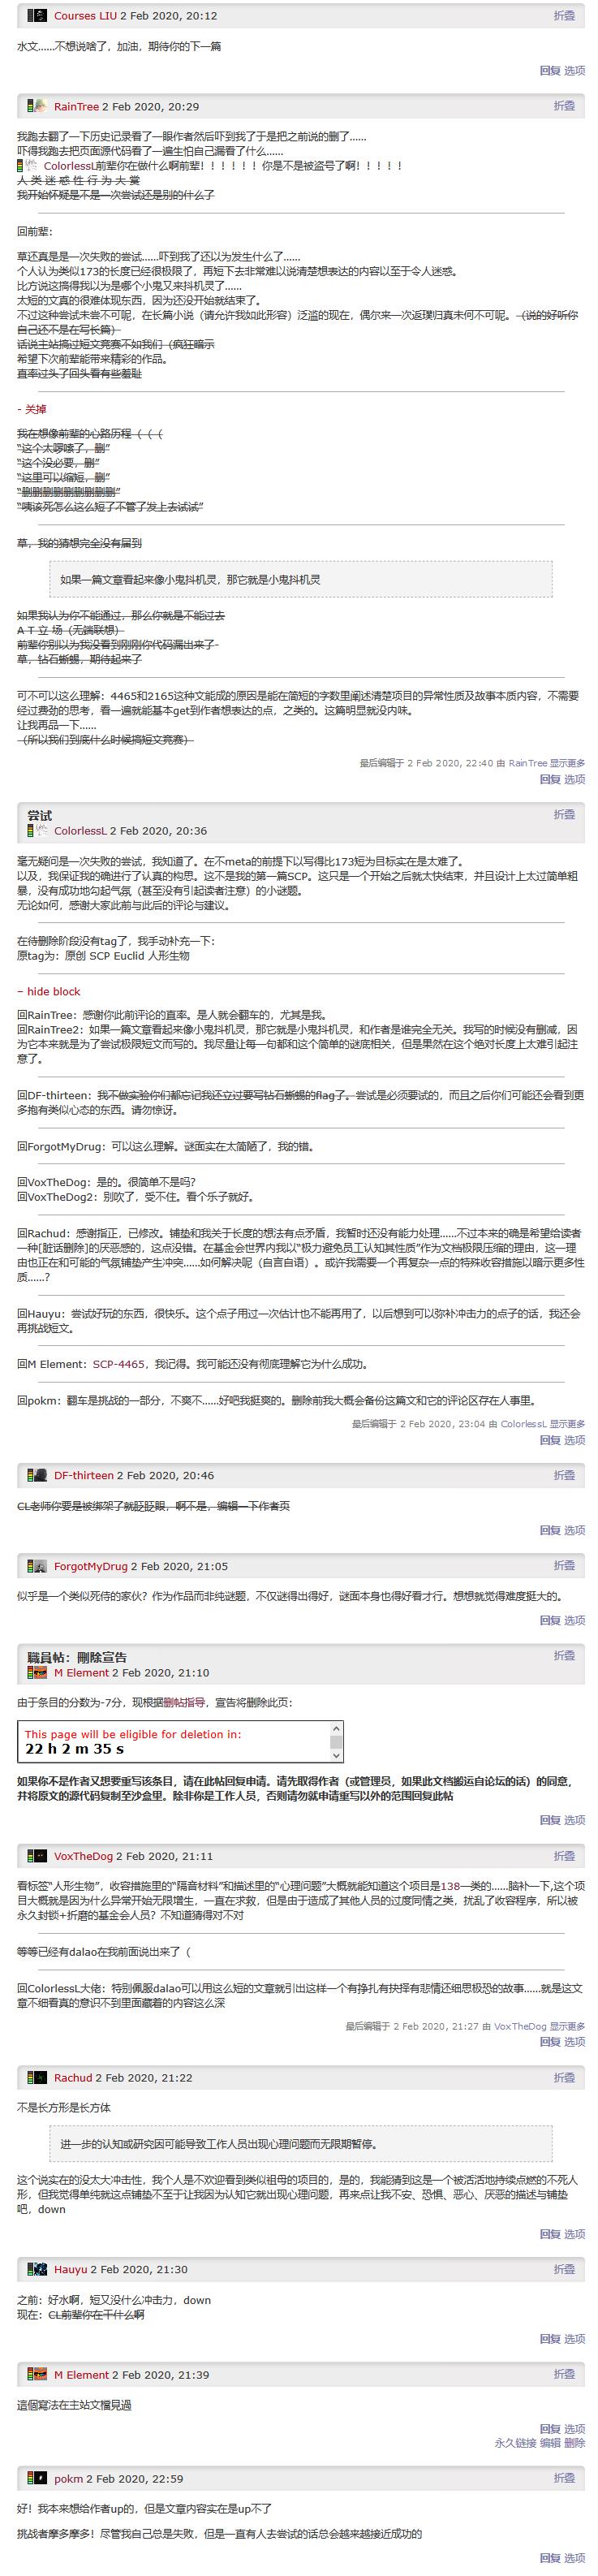 cn-1651-comment.png